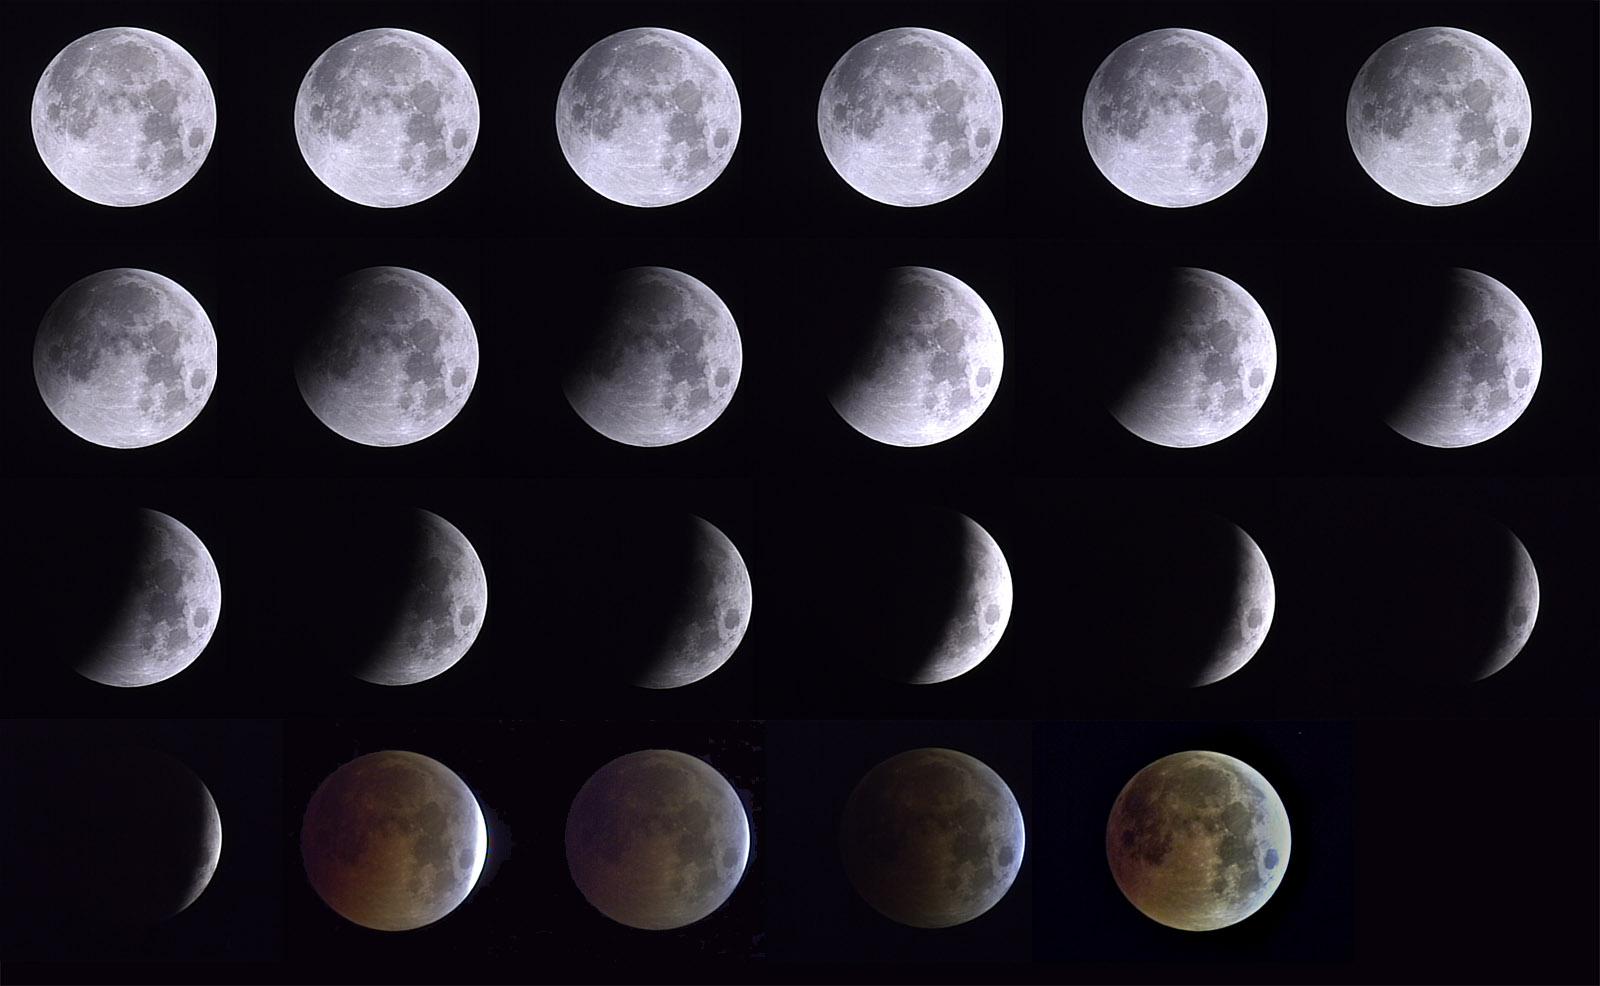 nasa lunar cycles - photo #36